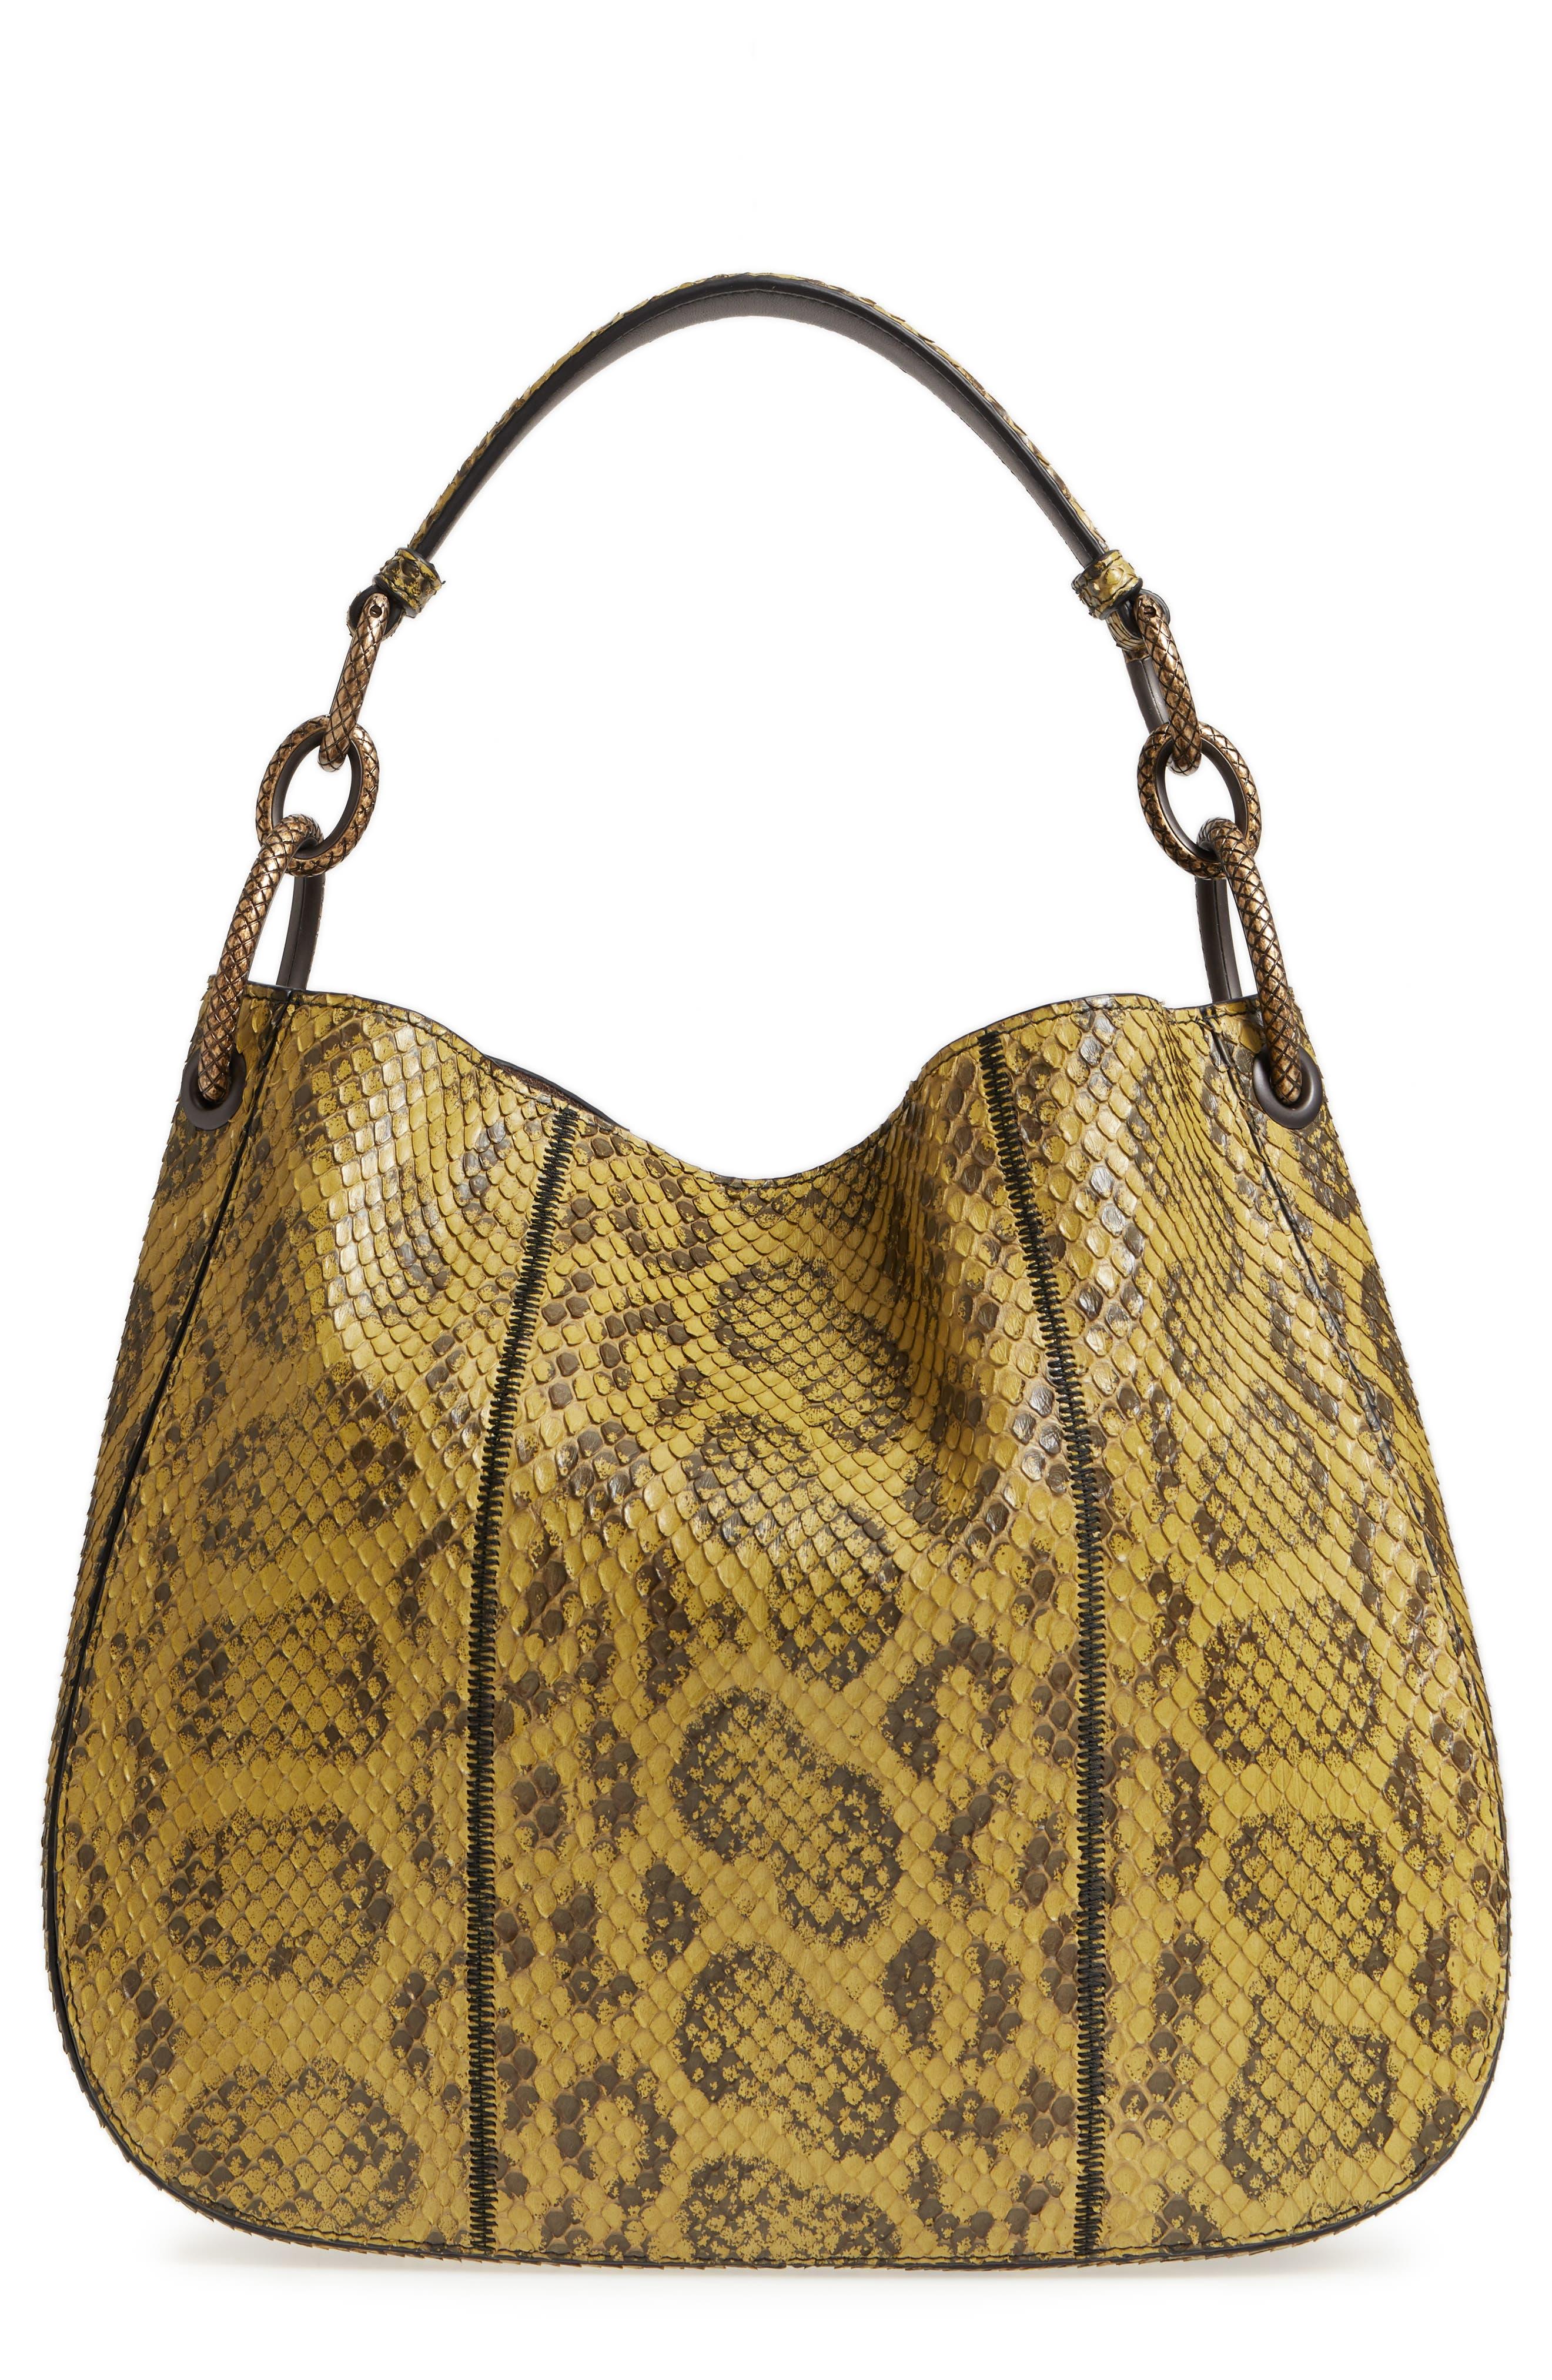 Small Loop Genuine Anaconda Snakeskin Leather Hobo - Yellow, Blackgold